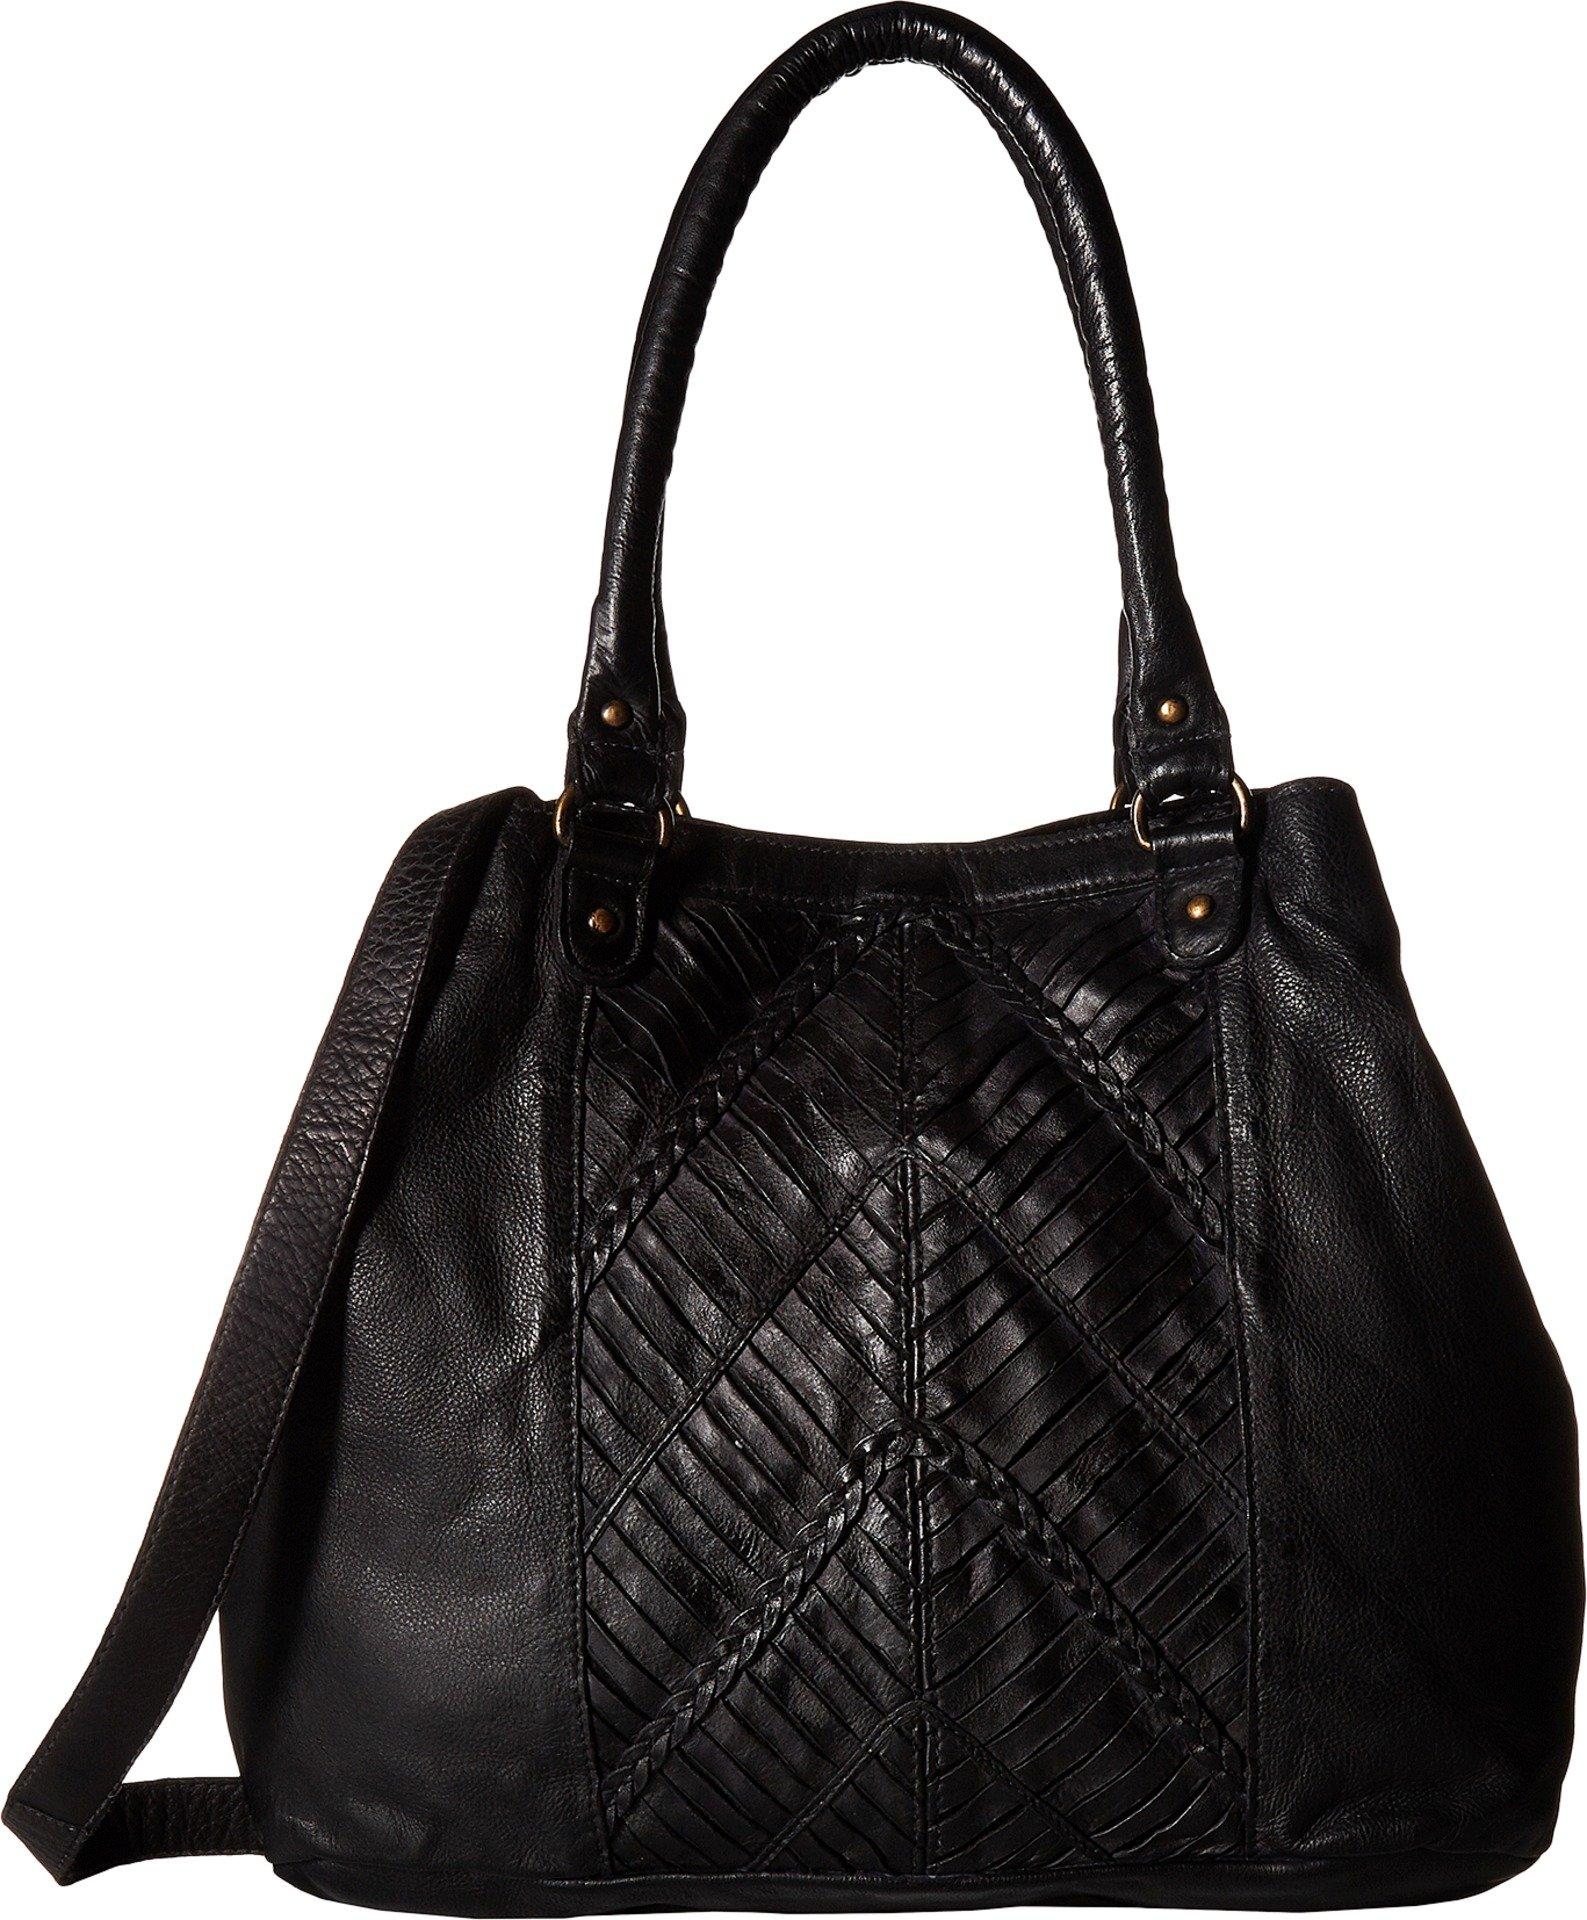 Amsterdam Heritage Women's Sanders Black Handbag